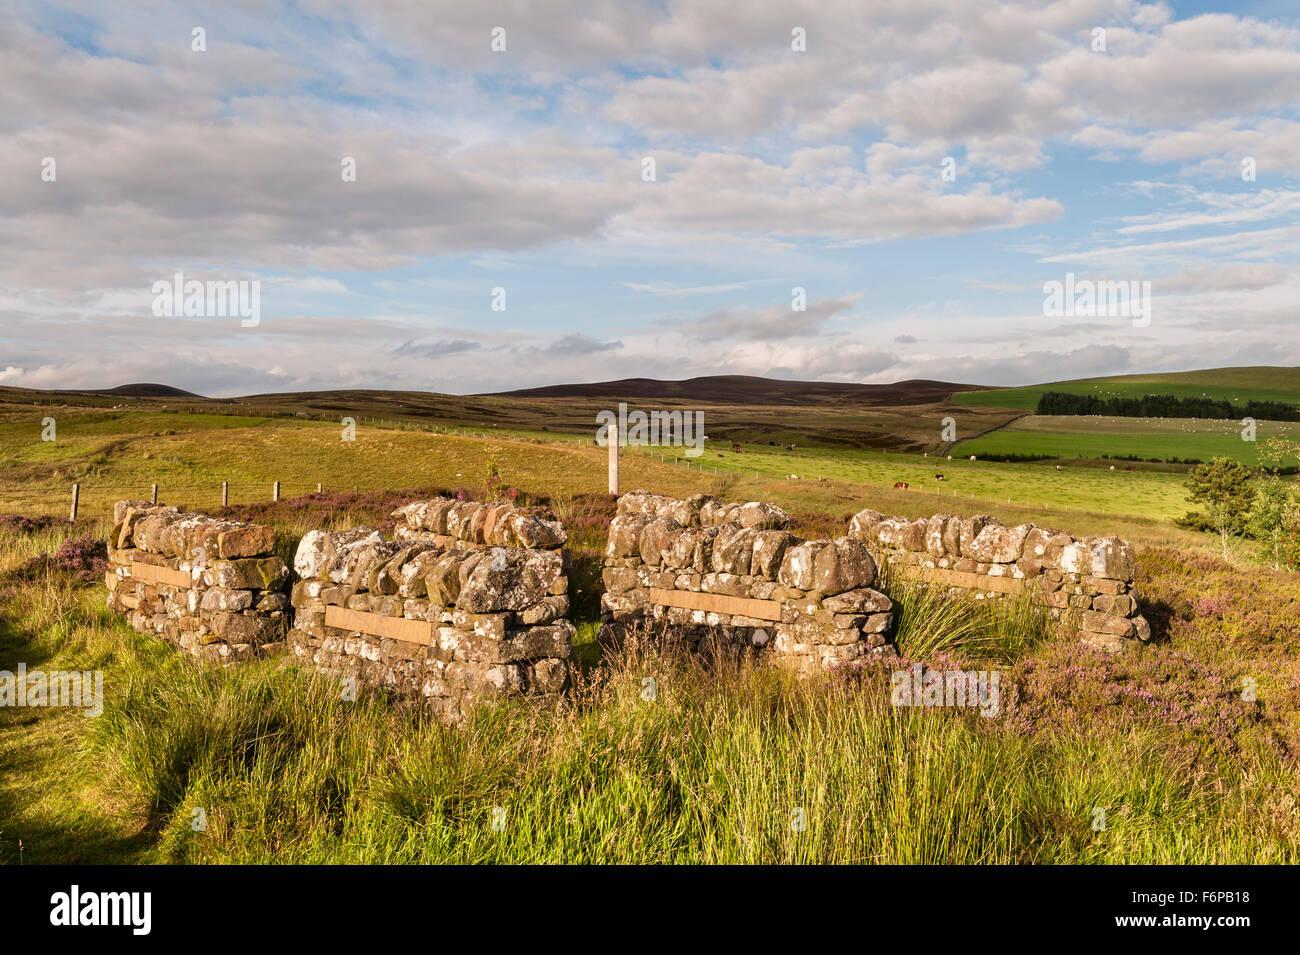 Little Sparta, Scotland. The garden created by the artist Ian Hamilton Finlay. 'Little Fields, Long Horizons' - Stock Image